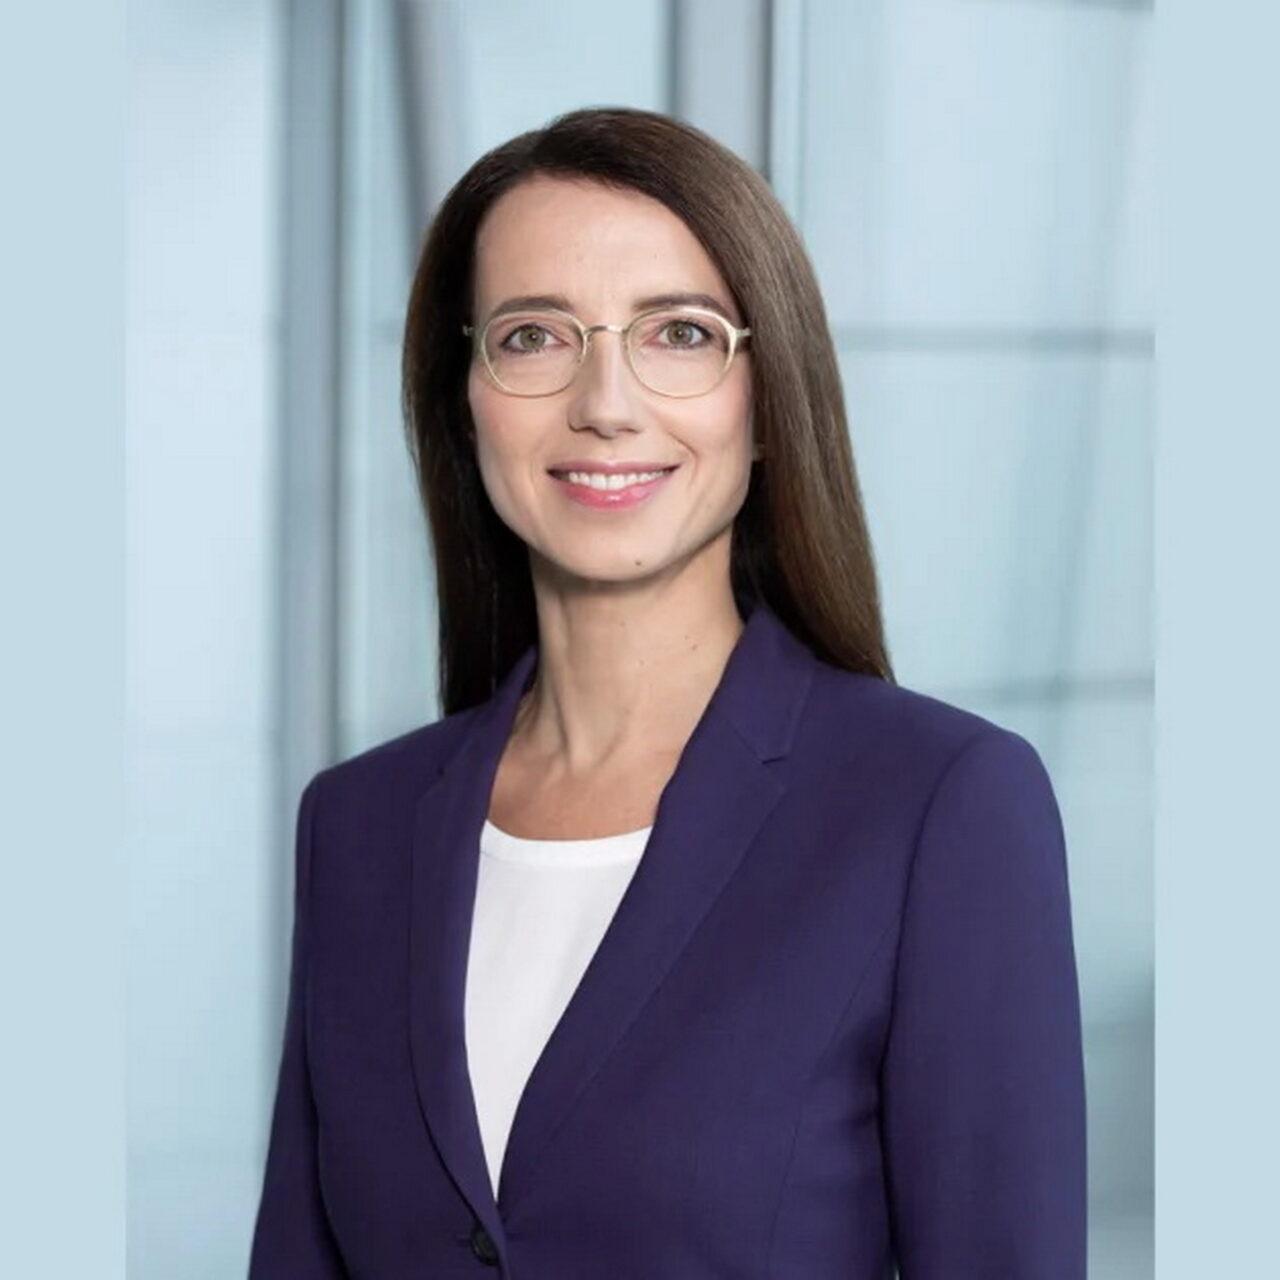 Erste Frau im apoBank-Vorstand